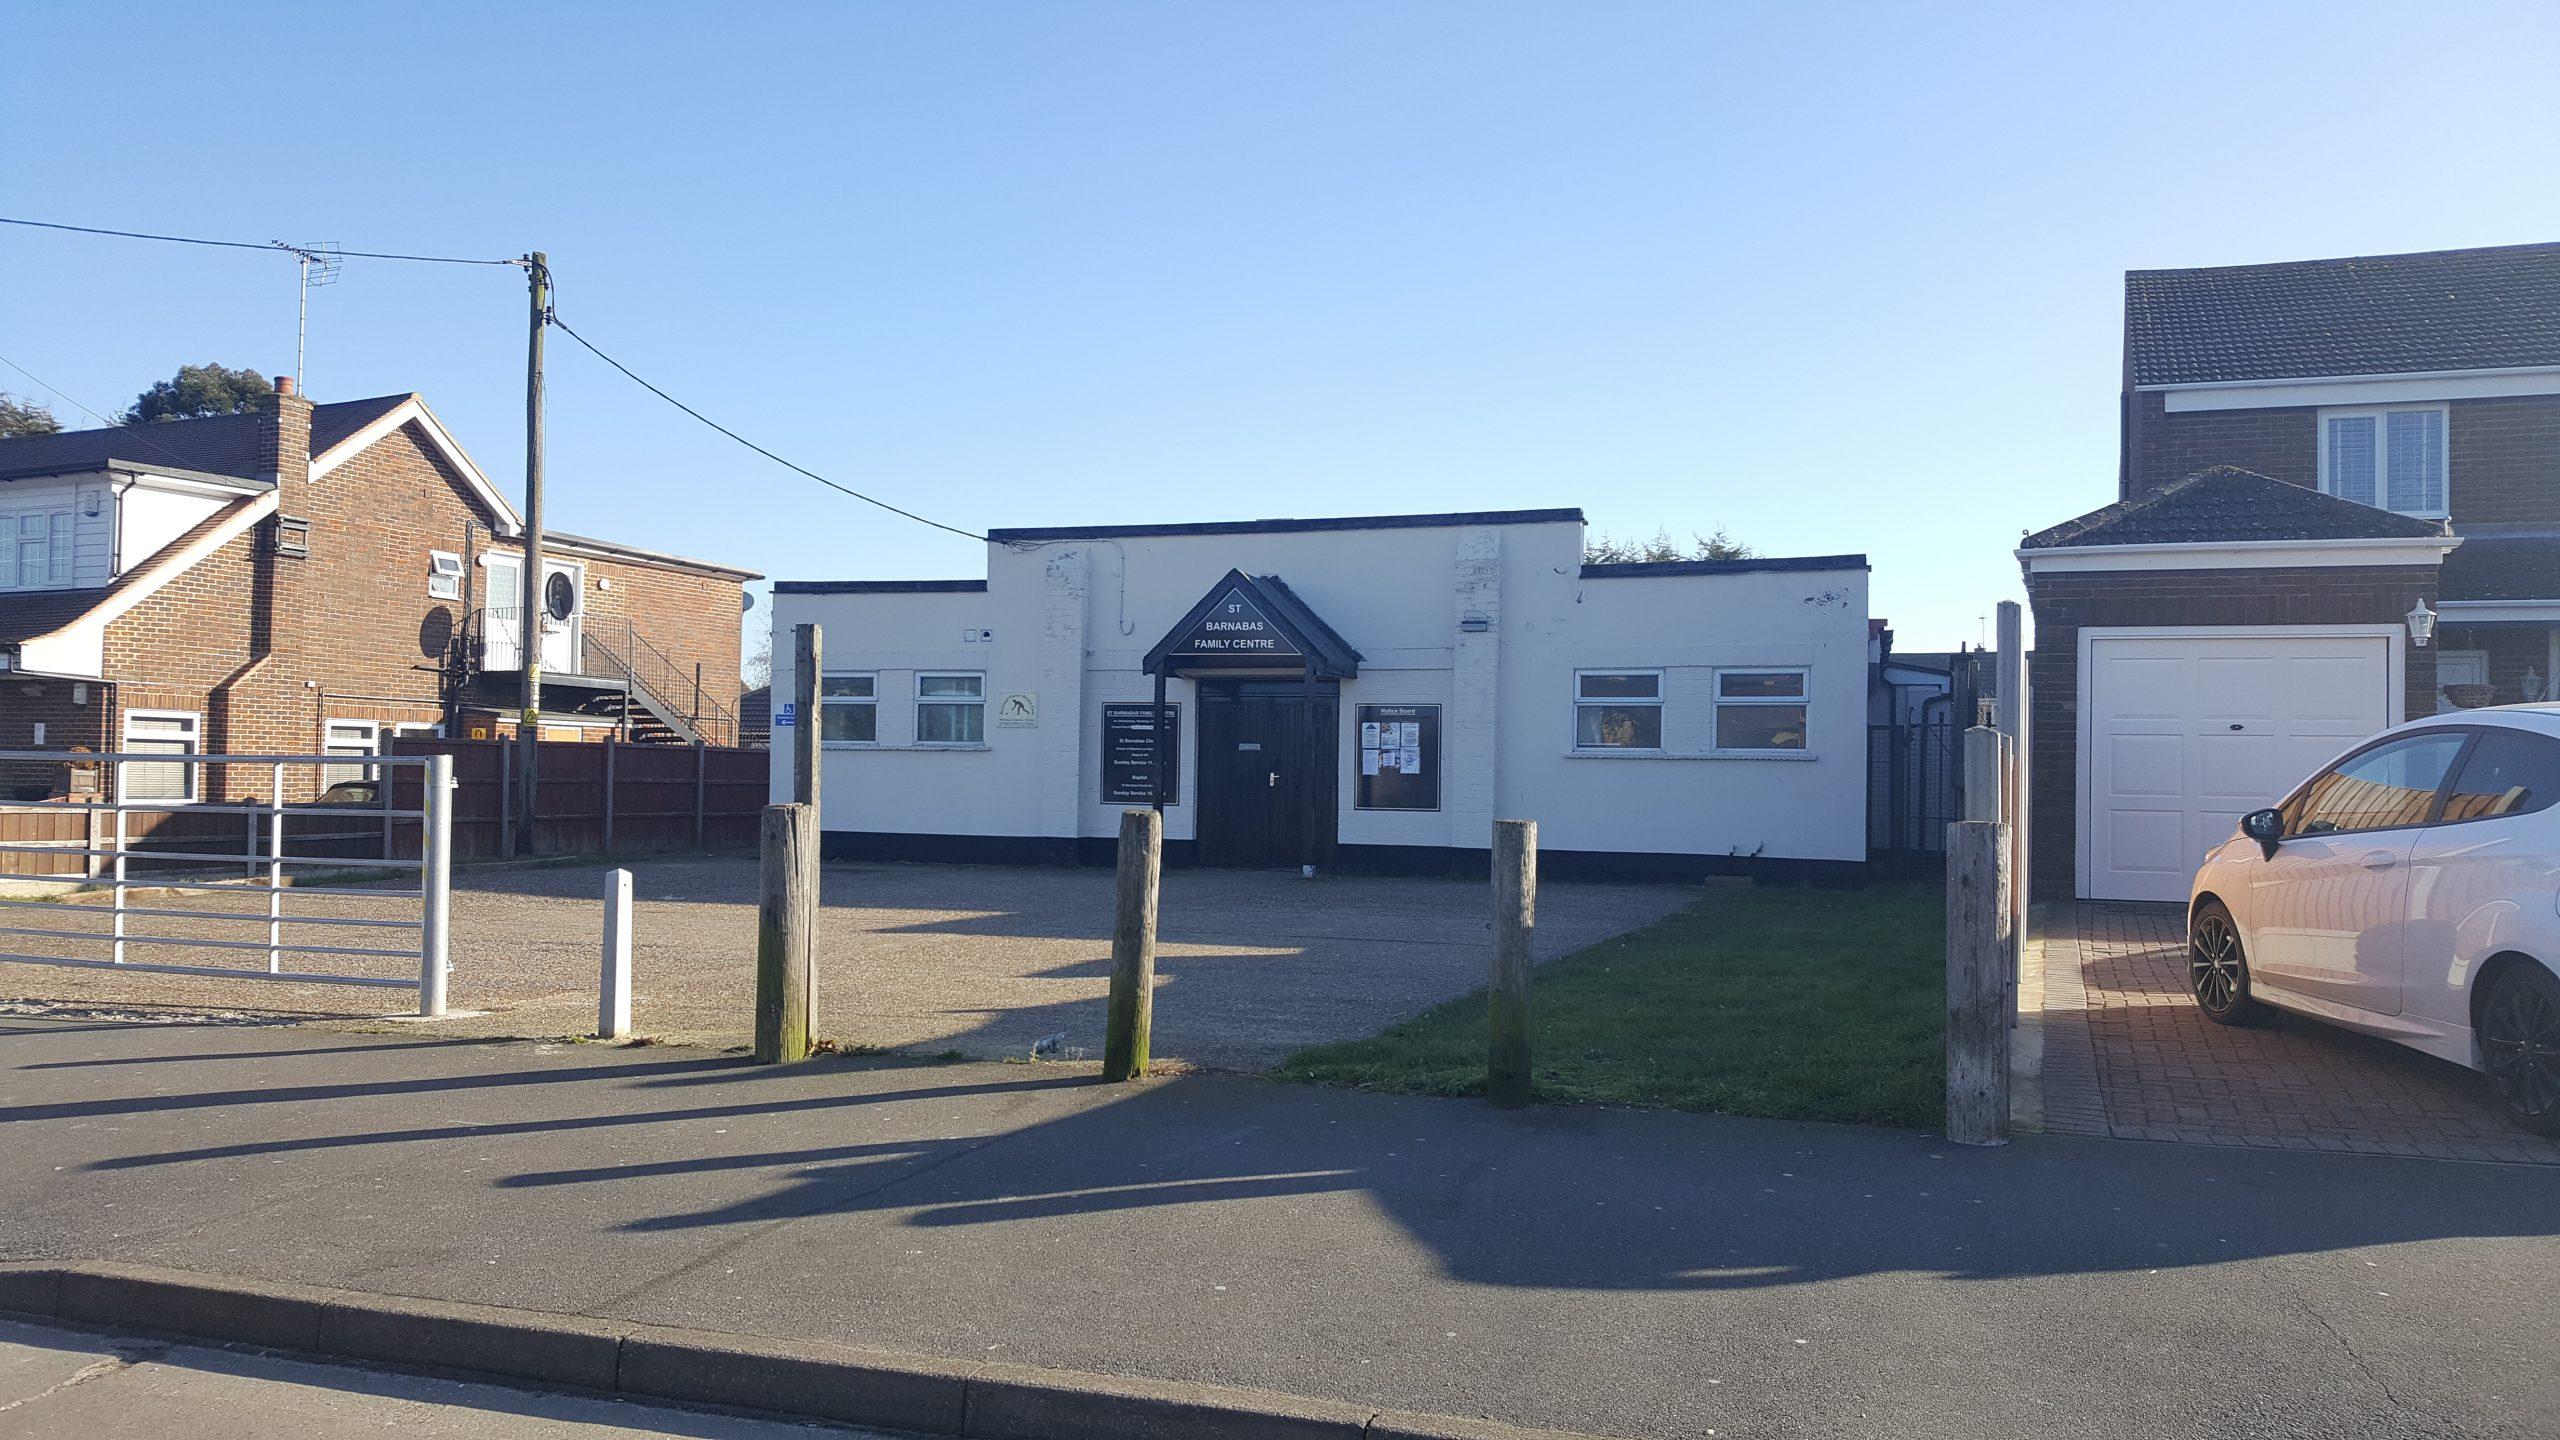 St Barnabas Family Centre